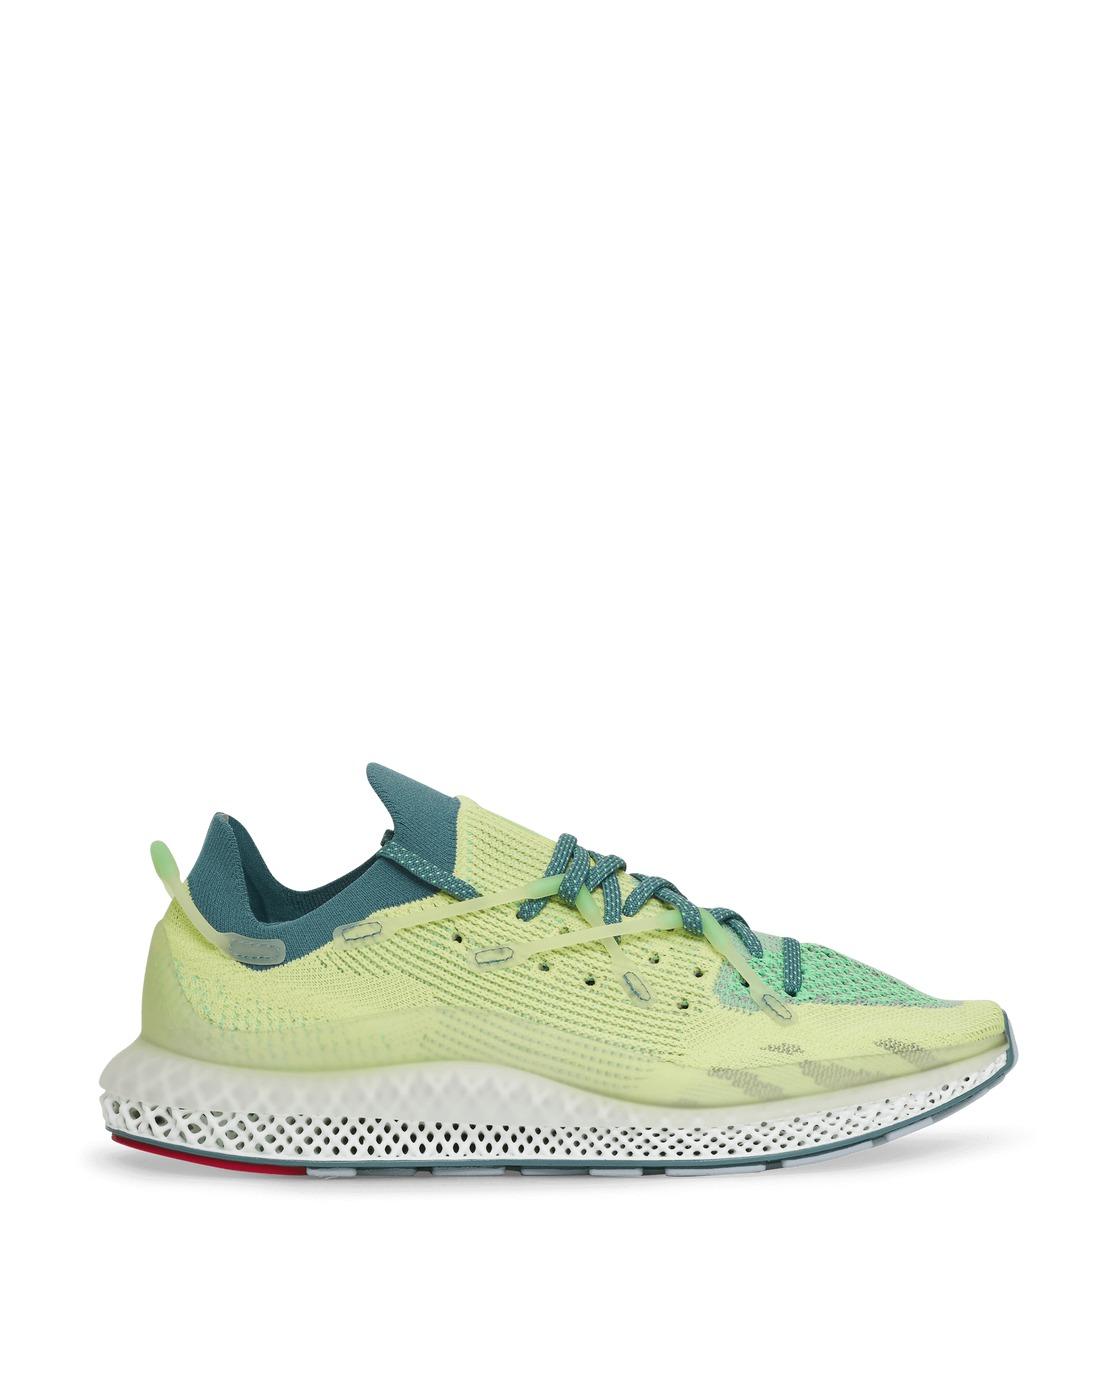 Photo: Adidas Originals 4d Fusio Sneakers Froz Yellow/Emerald 41